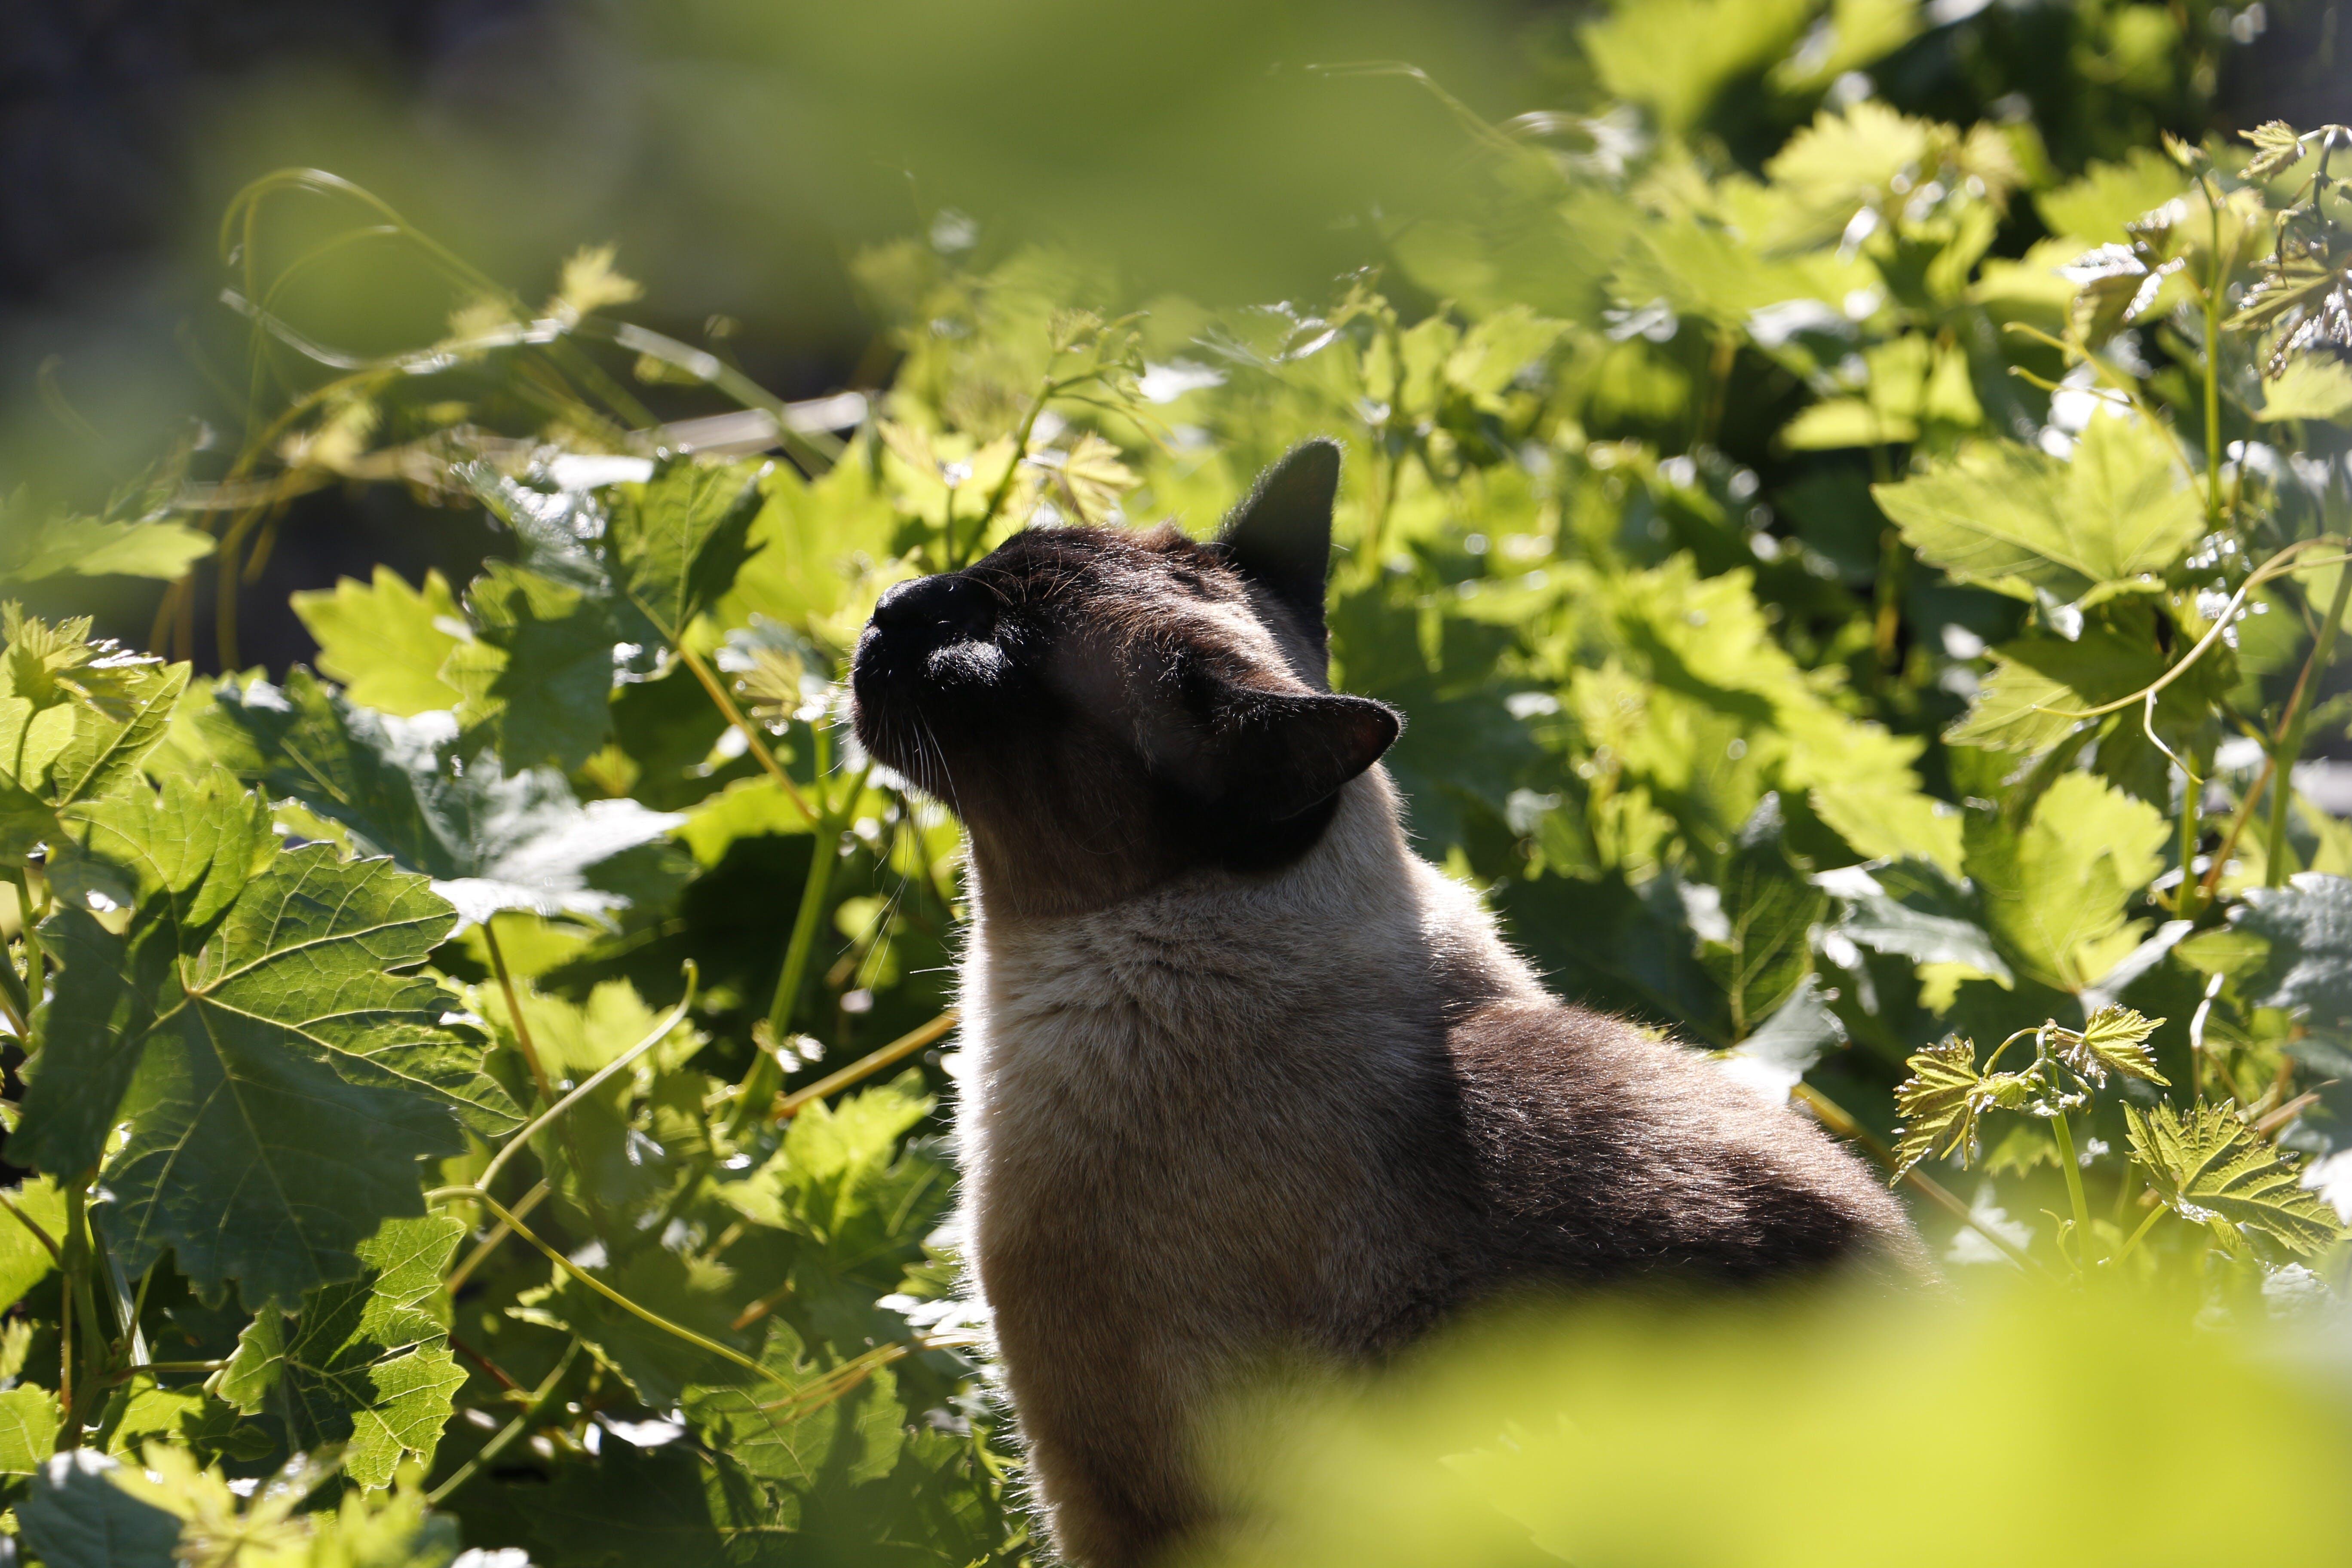 Cat Beside Green Leafed Plants